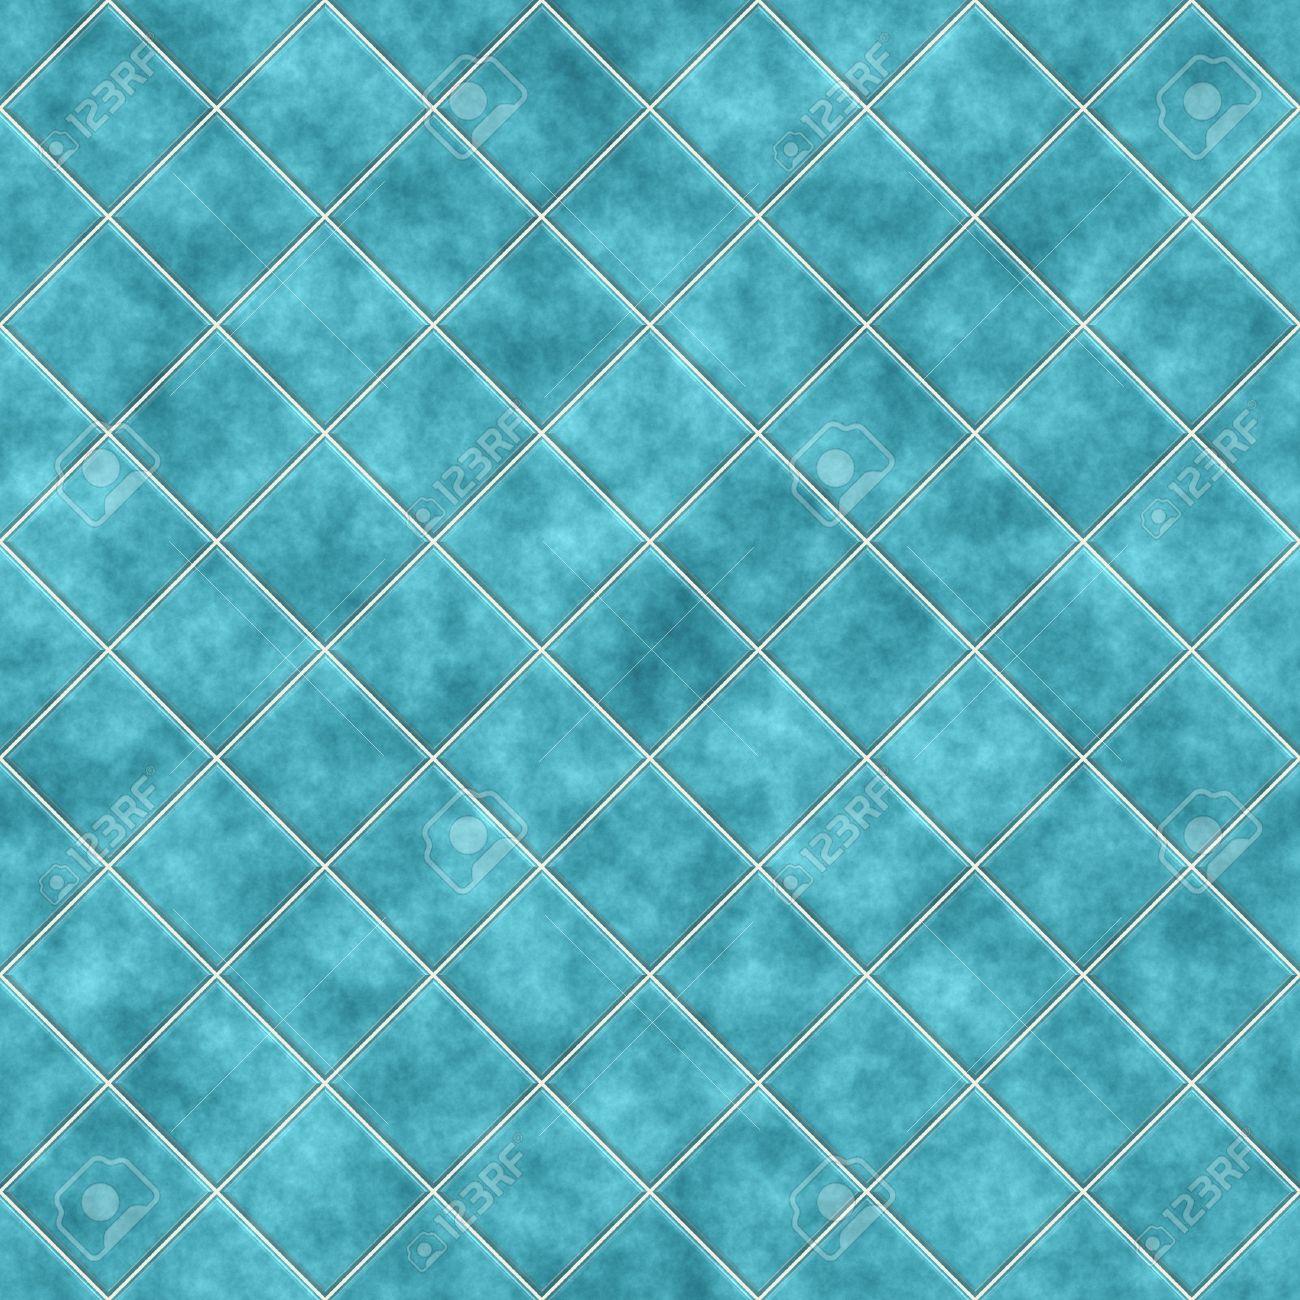 Green tiles kitchen texture - Seamless Blue Tiles Texture Background Kitchen Or Bathroom Concept Stock Photo 7306533